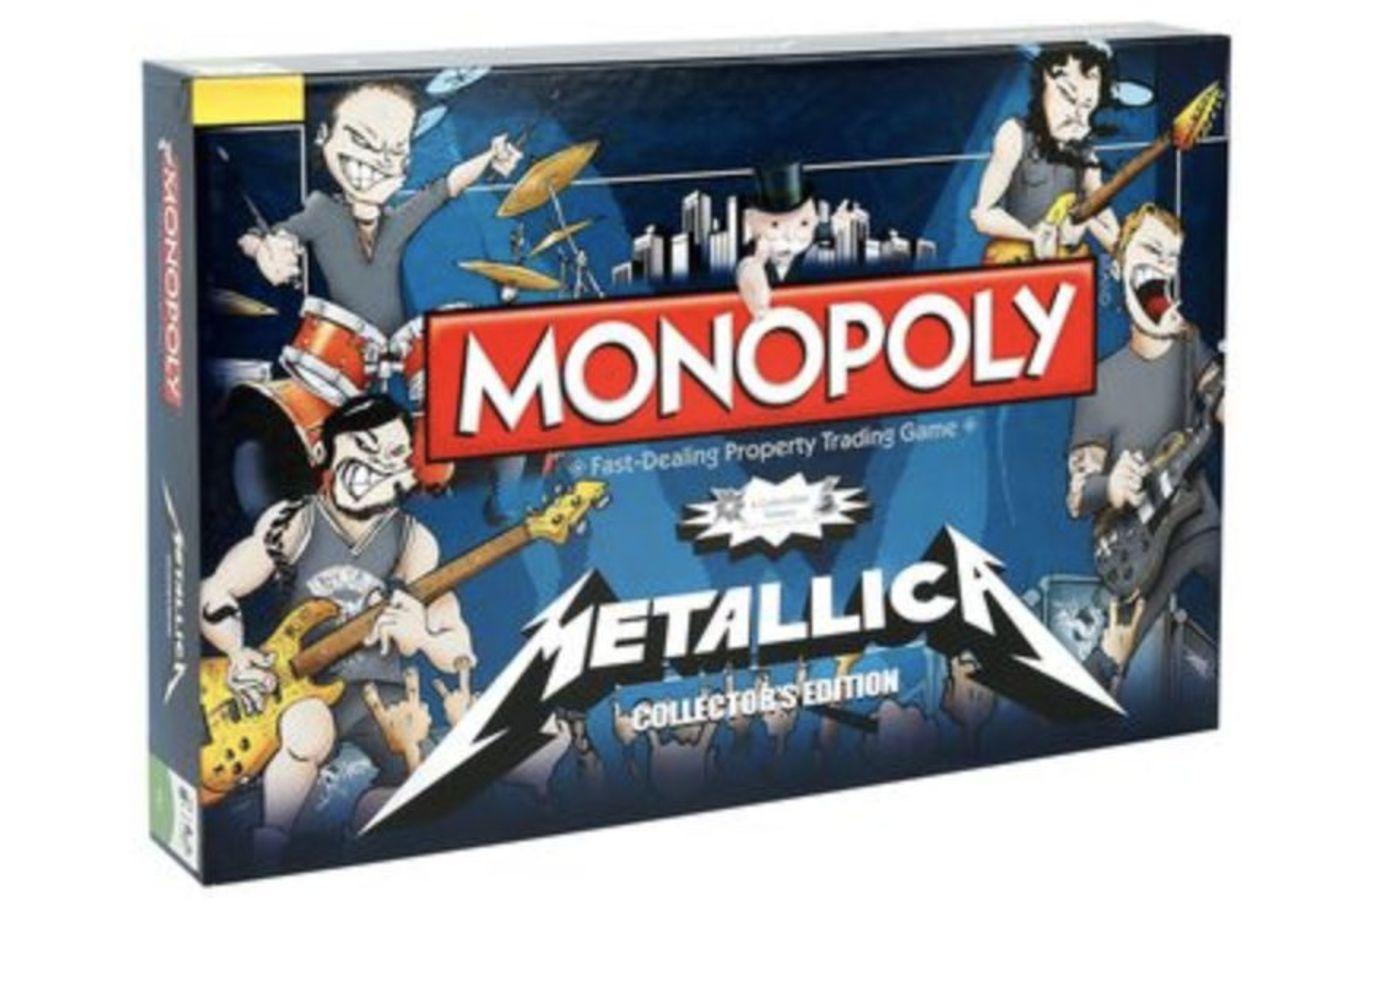 Metallica联名的棋盘游戏